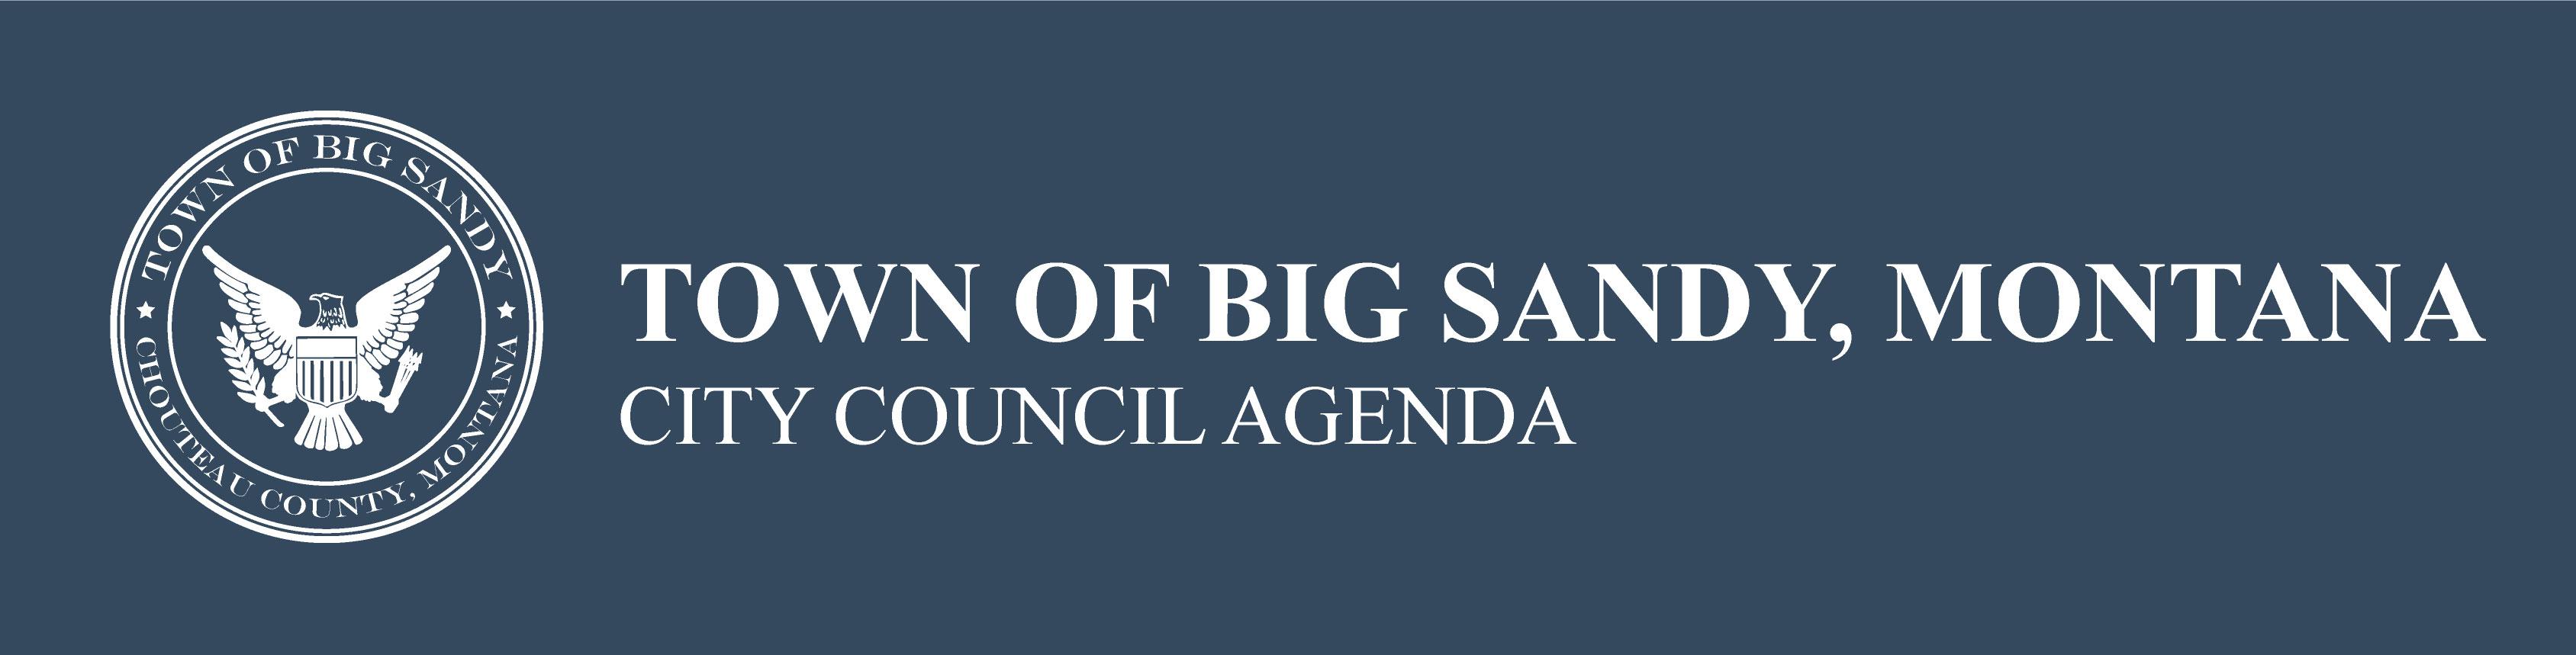 Town of Big Sandy, Montana City Council Agenda